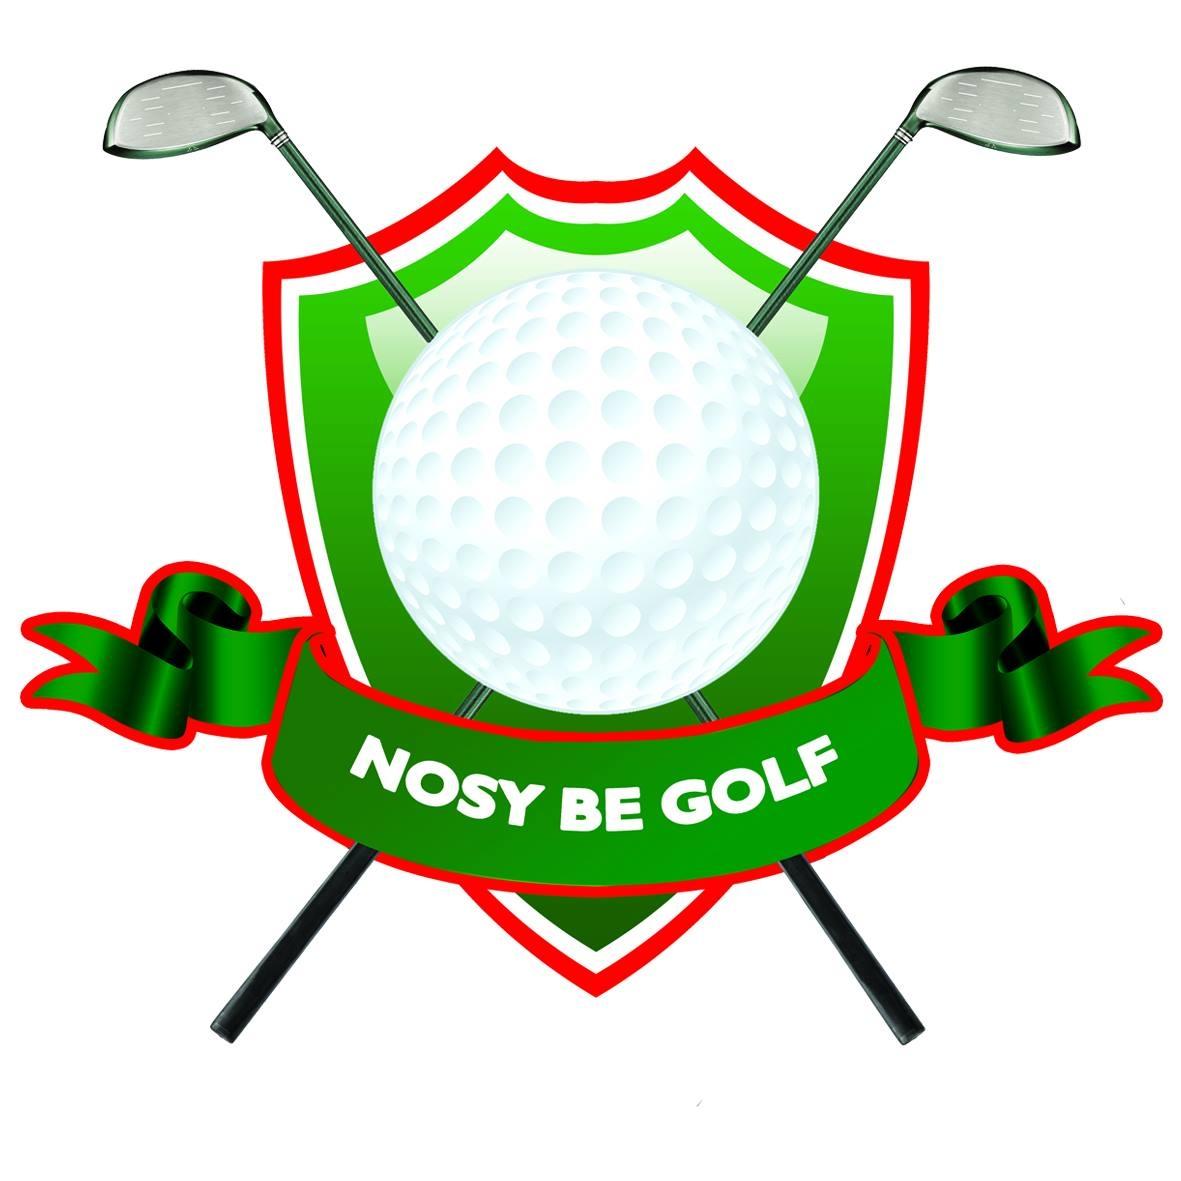 Nosy Be GOLF